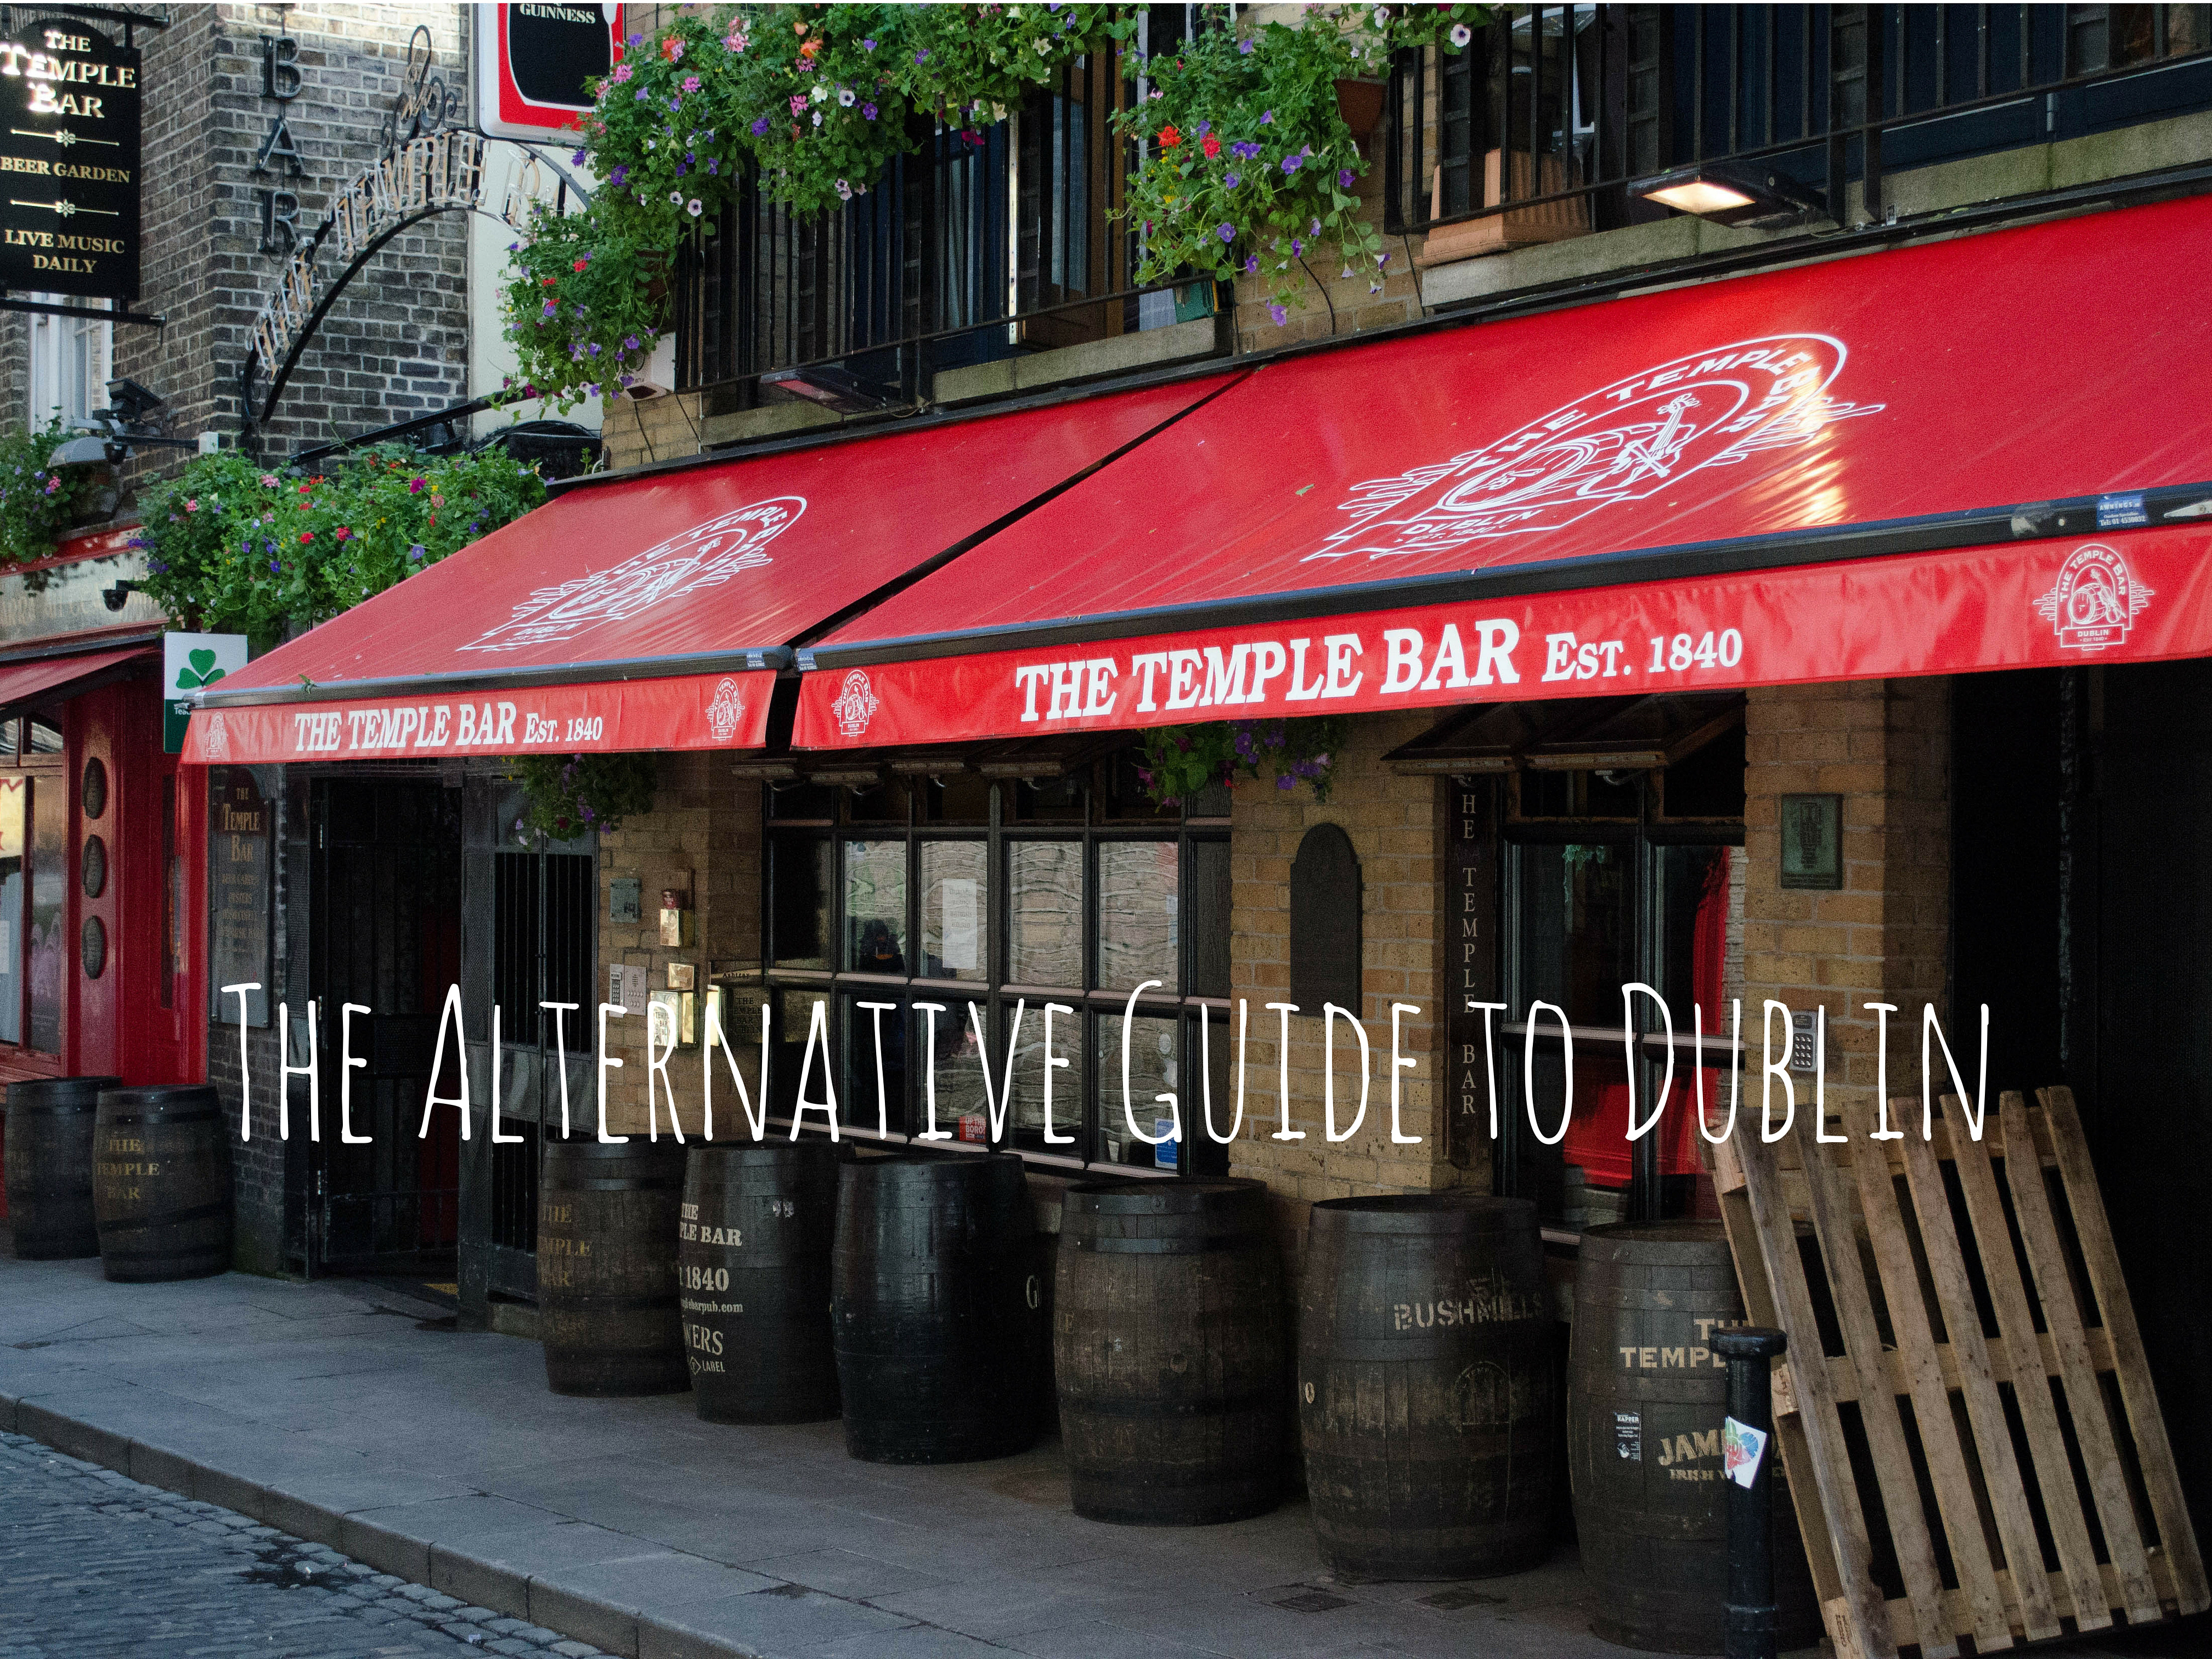 The Alternative Guide to Dublin